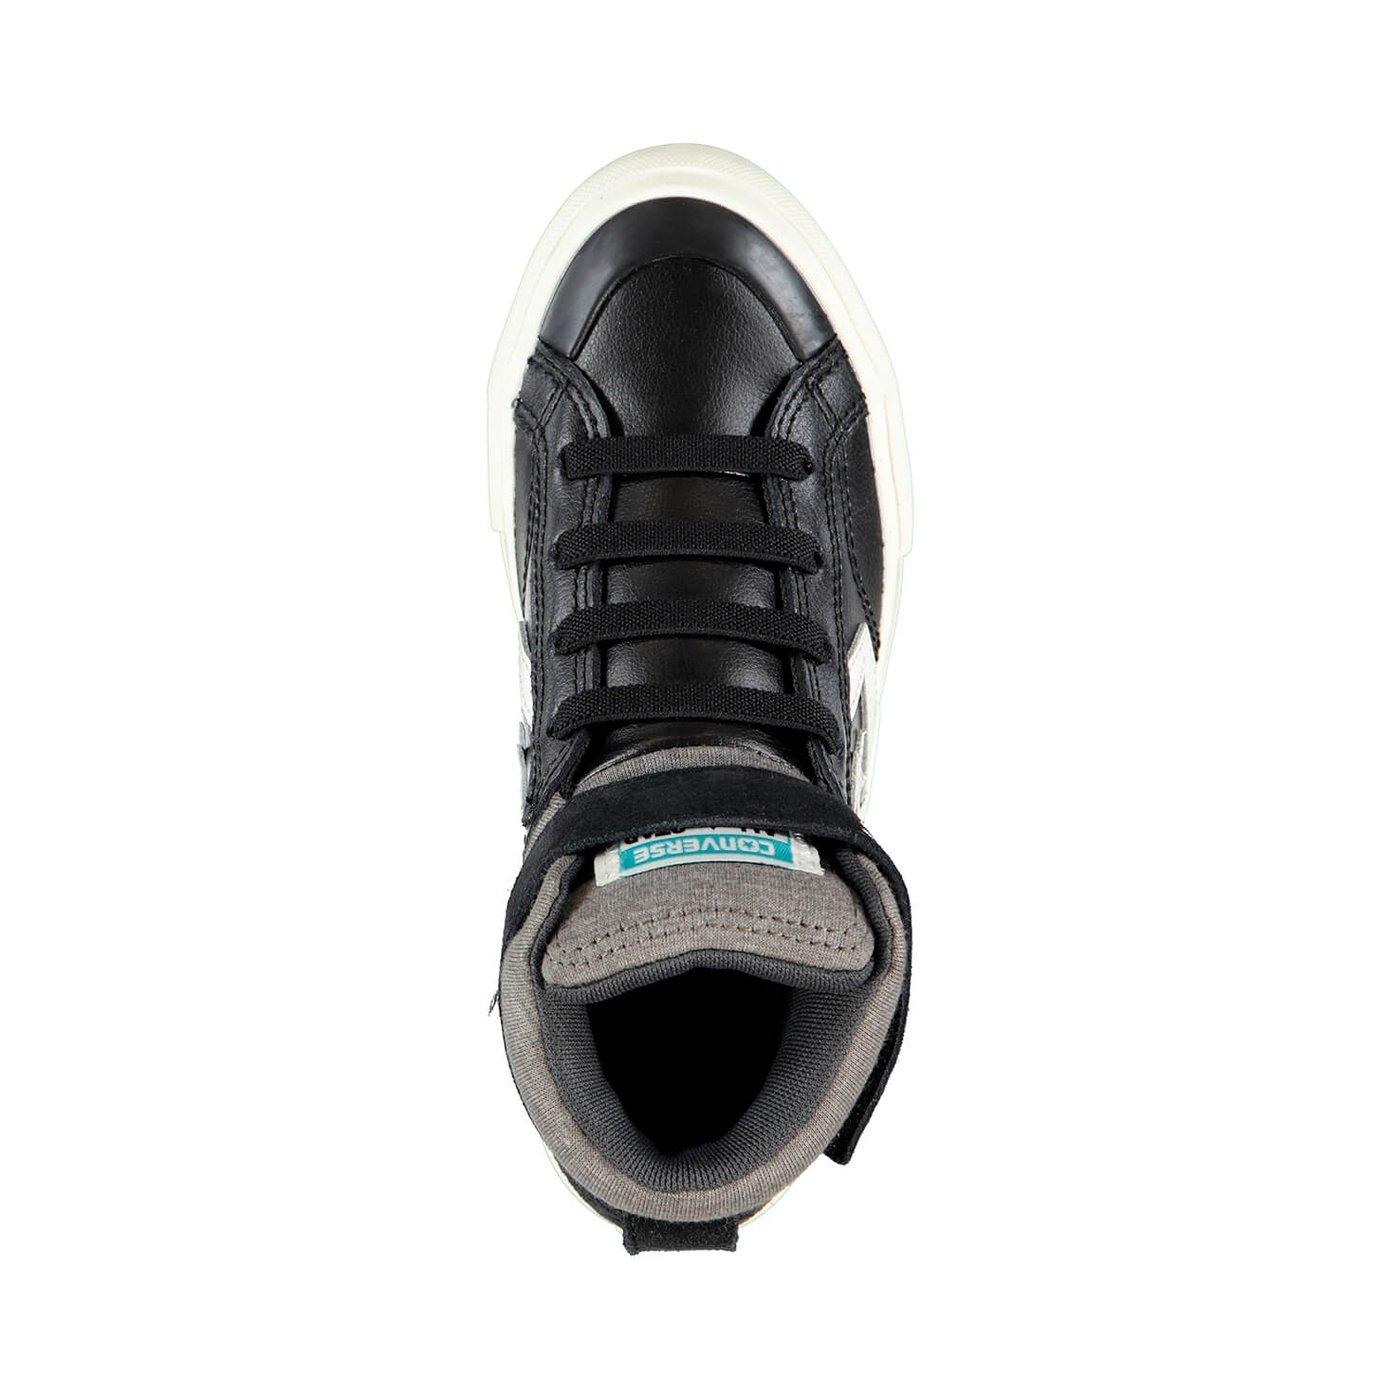 Converse Pro Blaze Strap Stretch Çocuk Siyah Sneaker